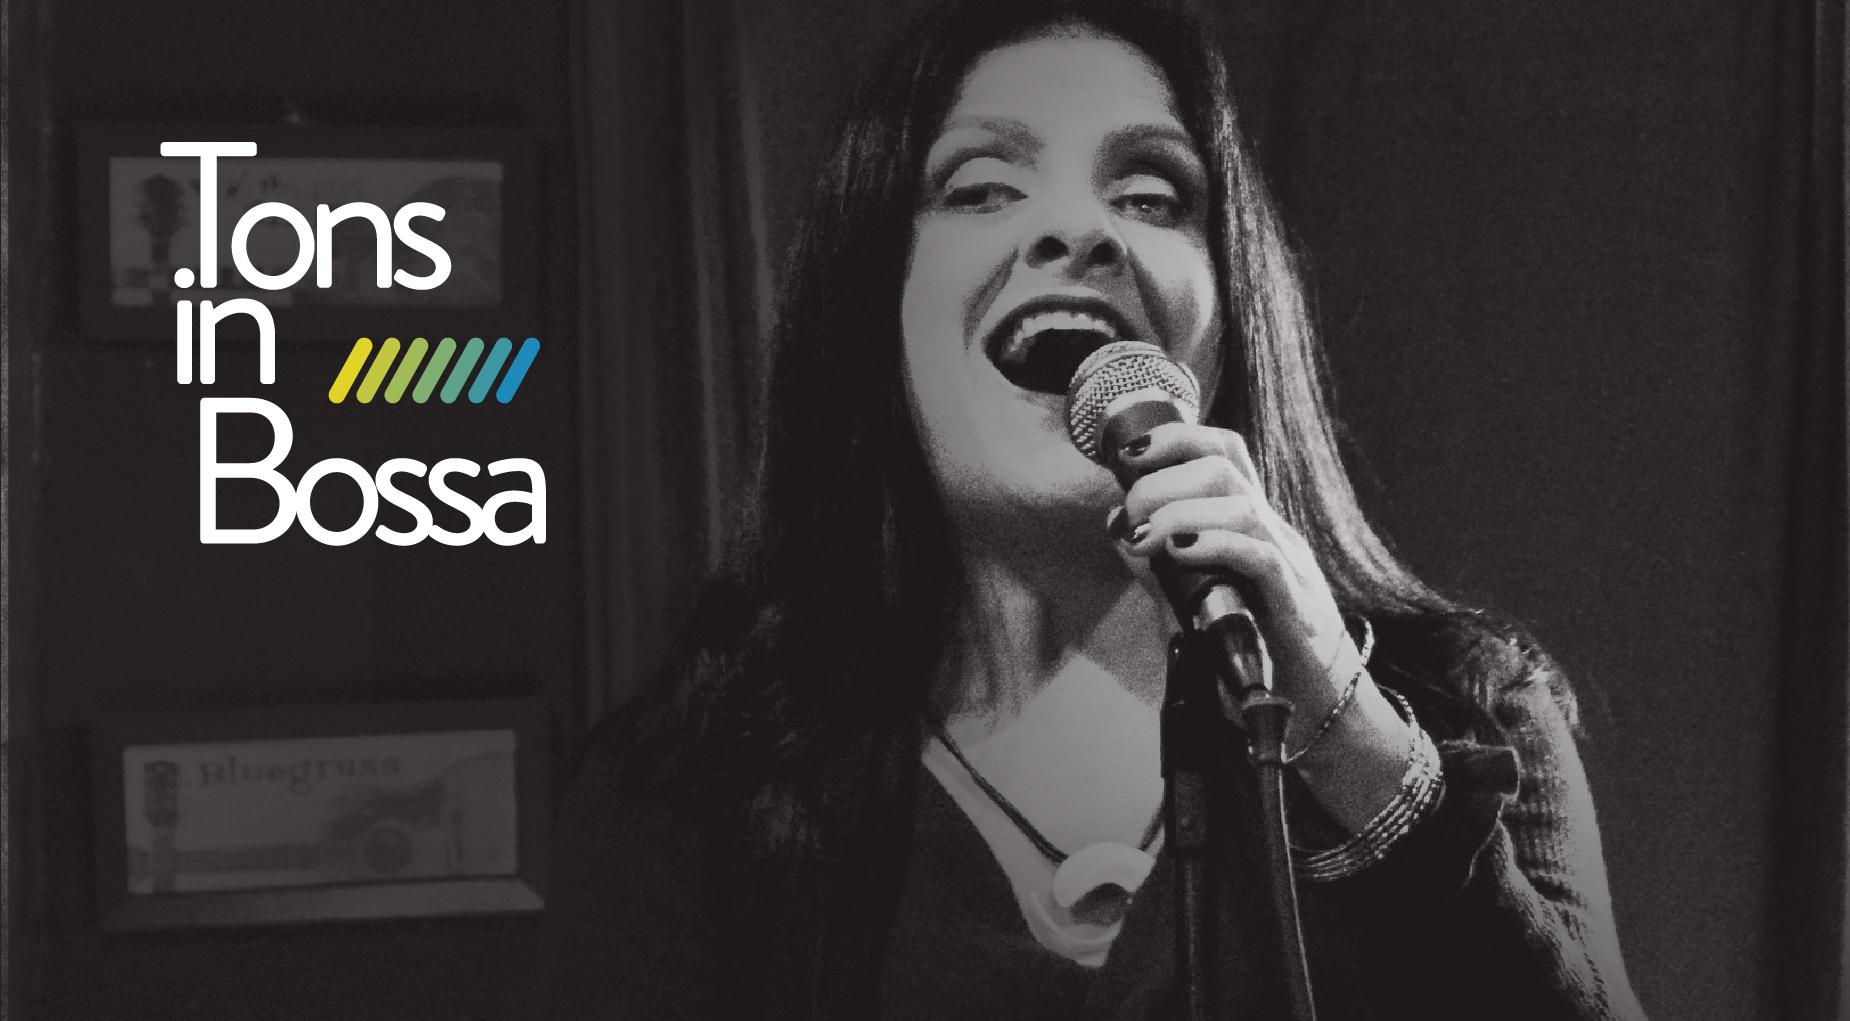 Tons In Bossa | Homenagem à Leny Andrade